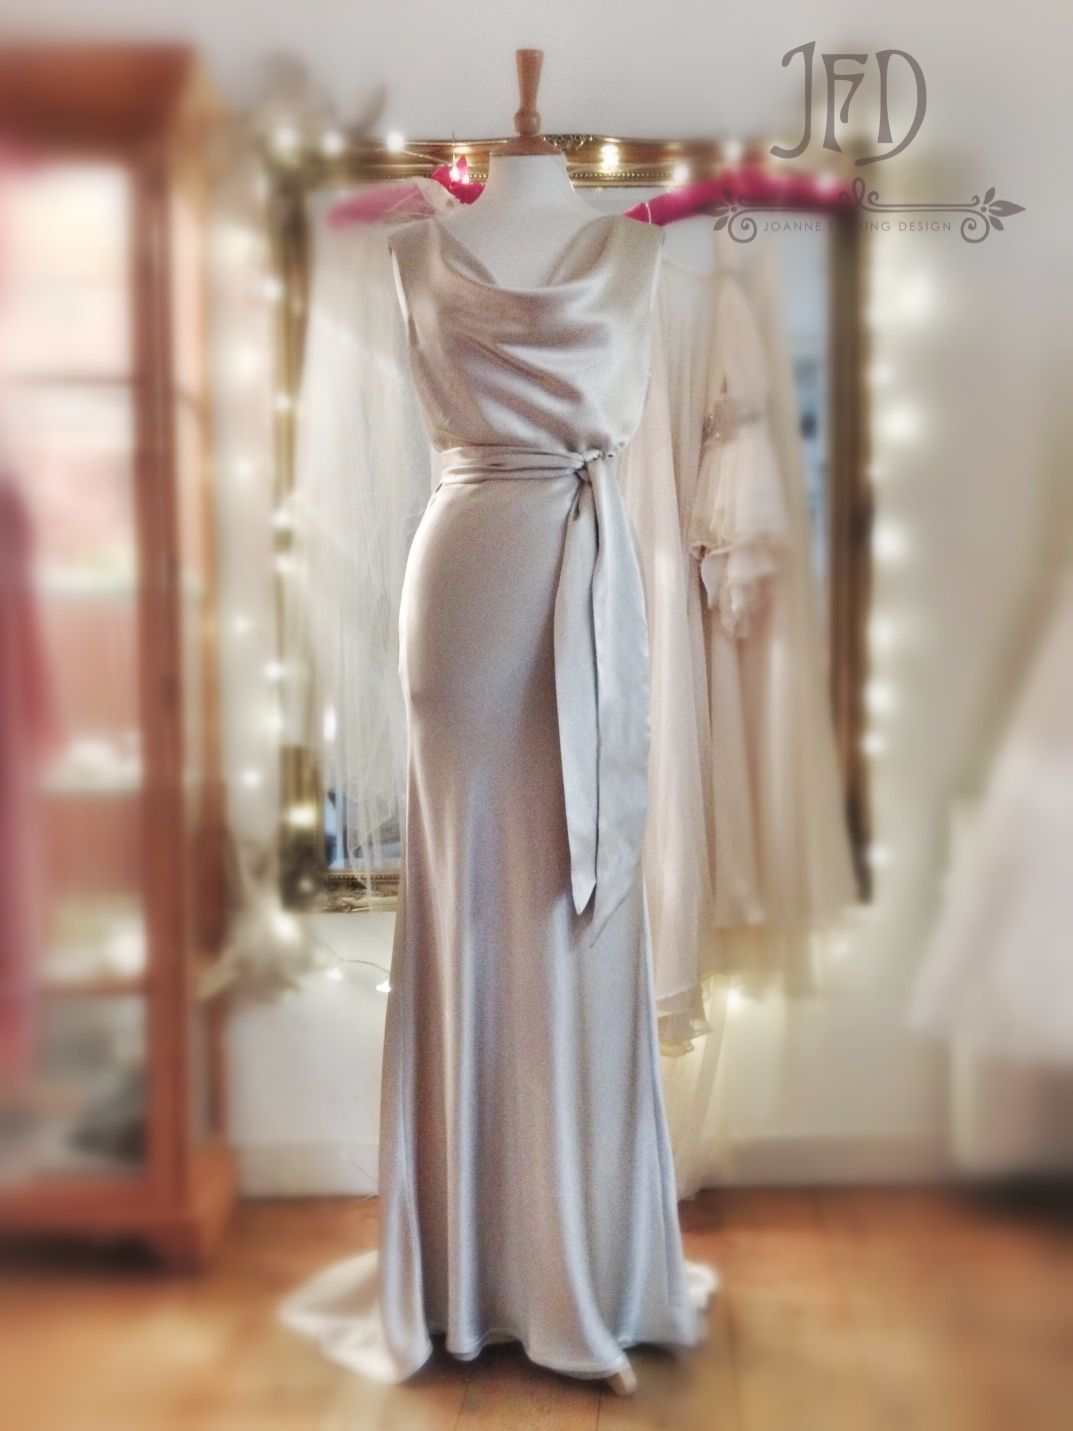 eb759ba5ee47ce 1930s inspired bias-cut oyster silk satin cowl neck wedding dress with  waist sash